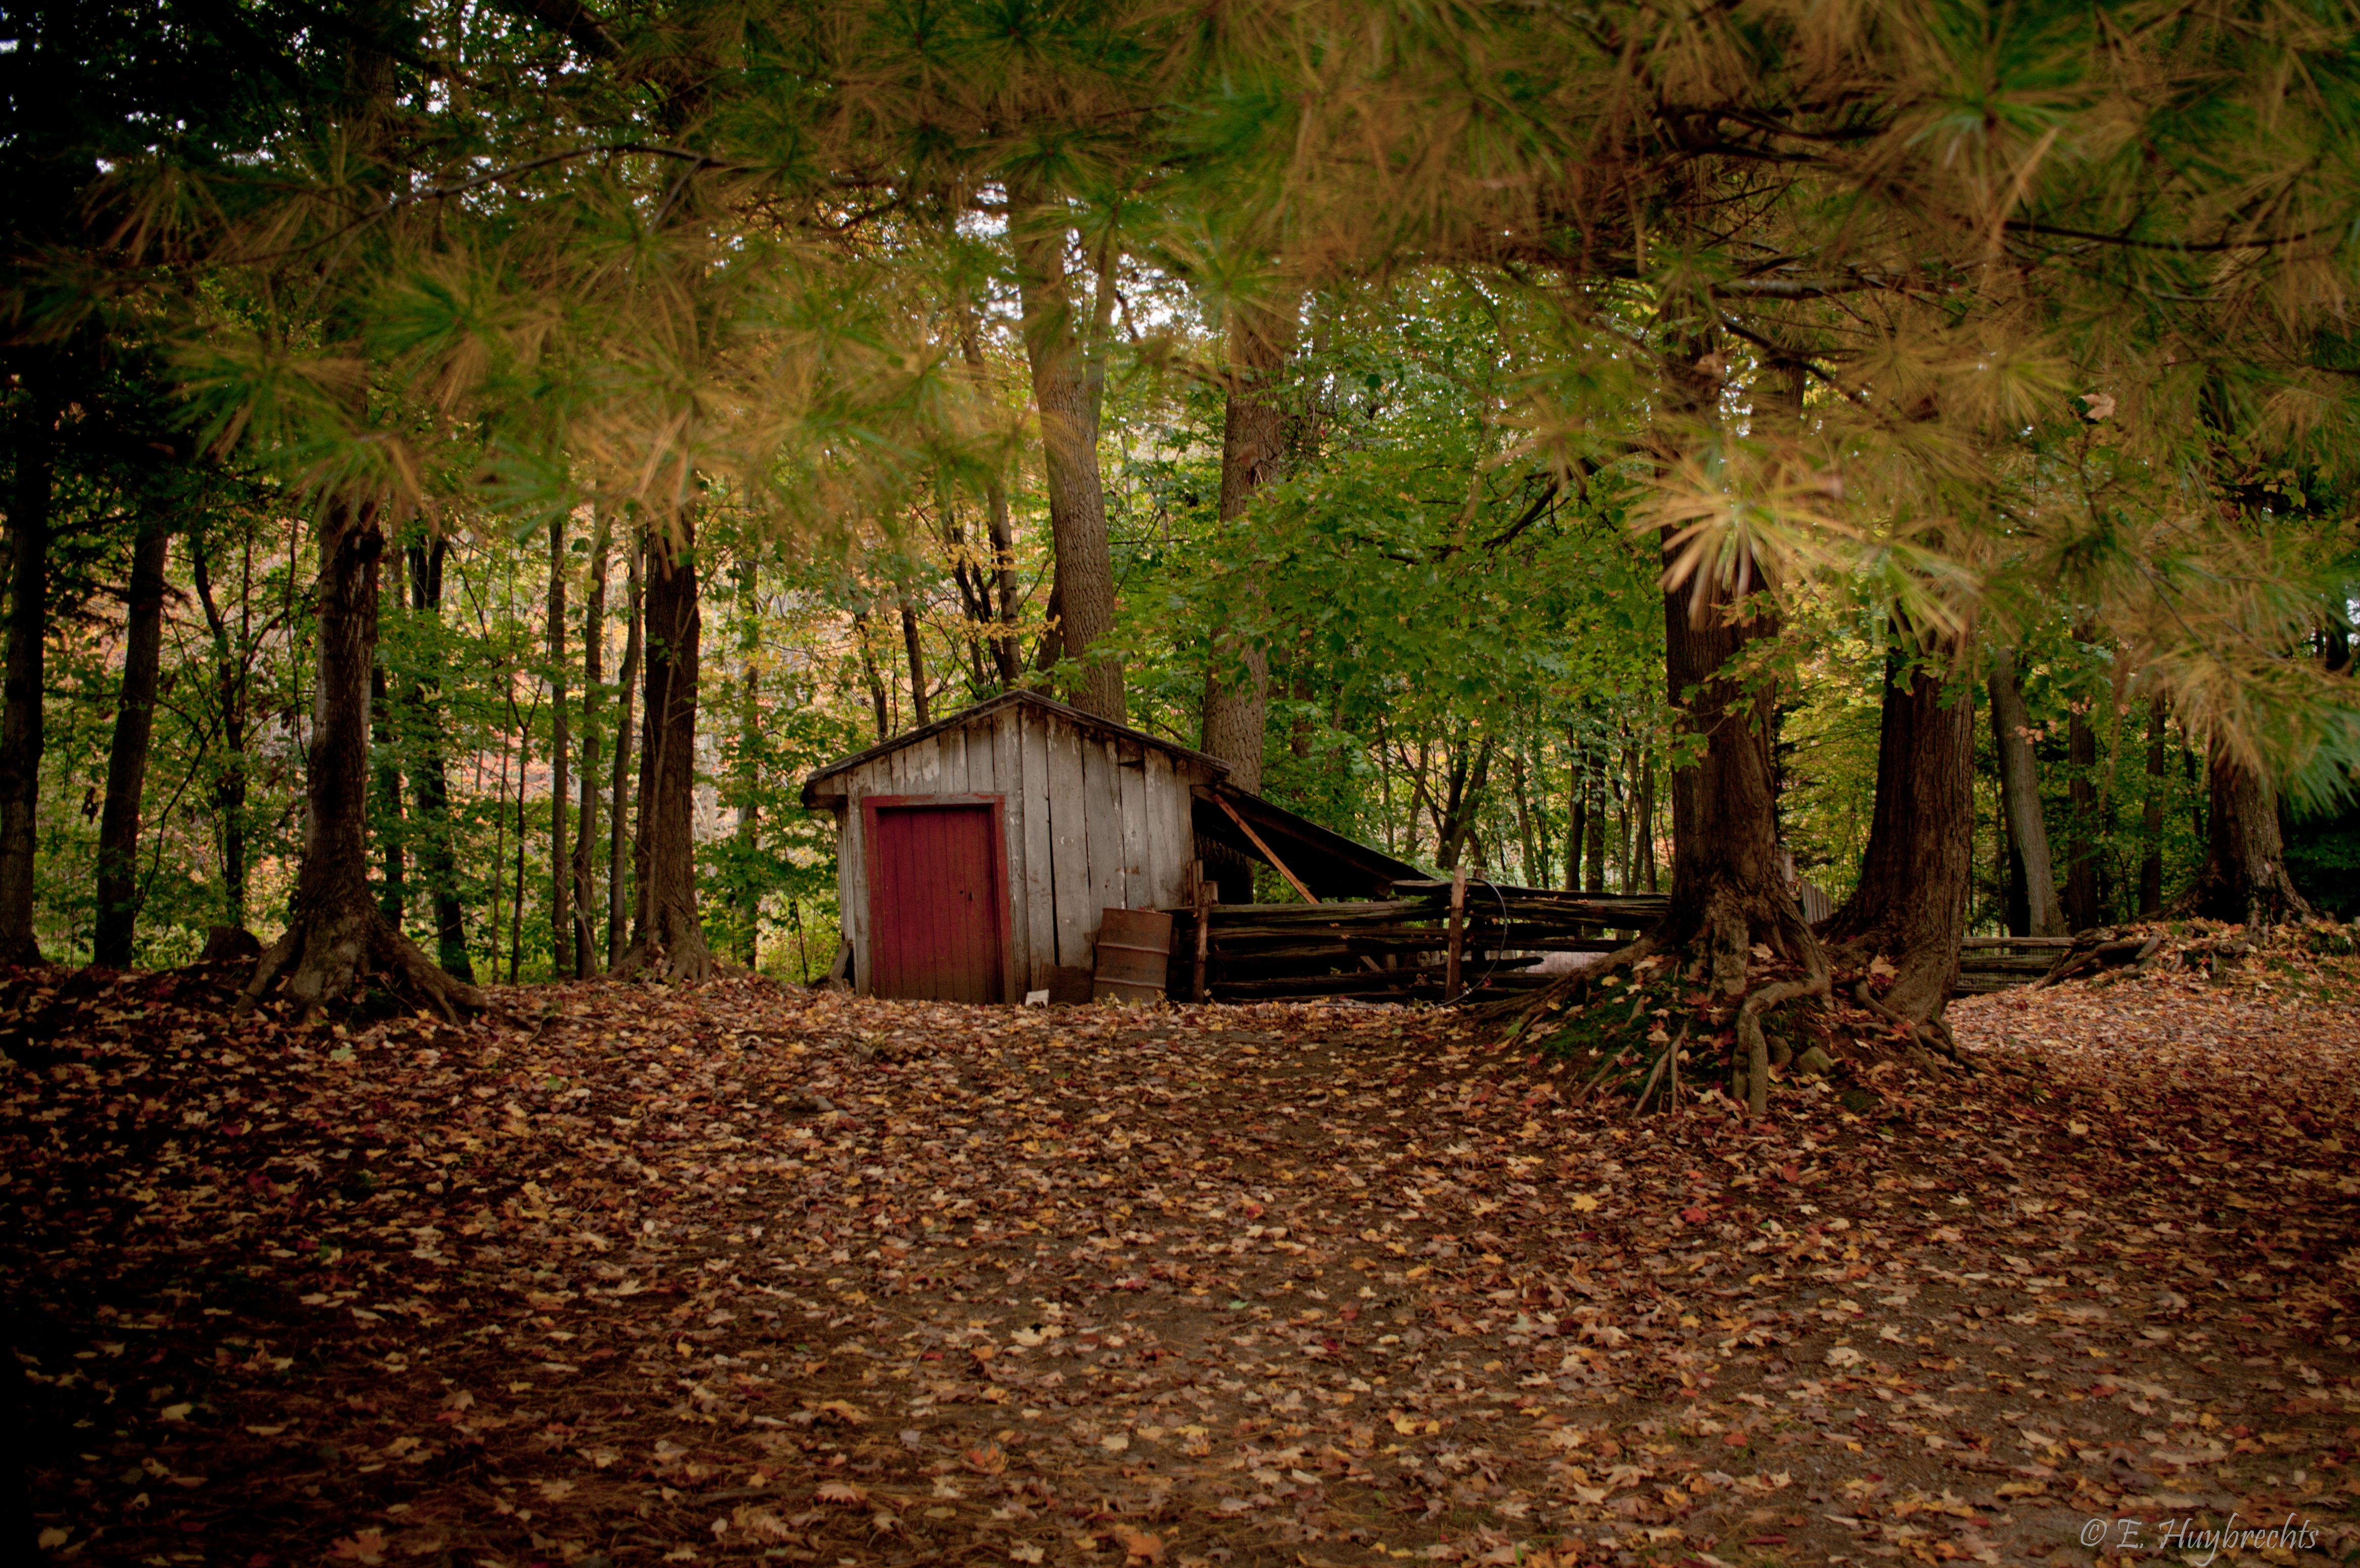 FileLa cabane au fond du bois (5067406929)jpg  Wikimedia Commons